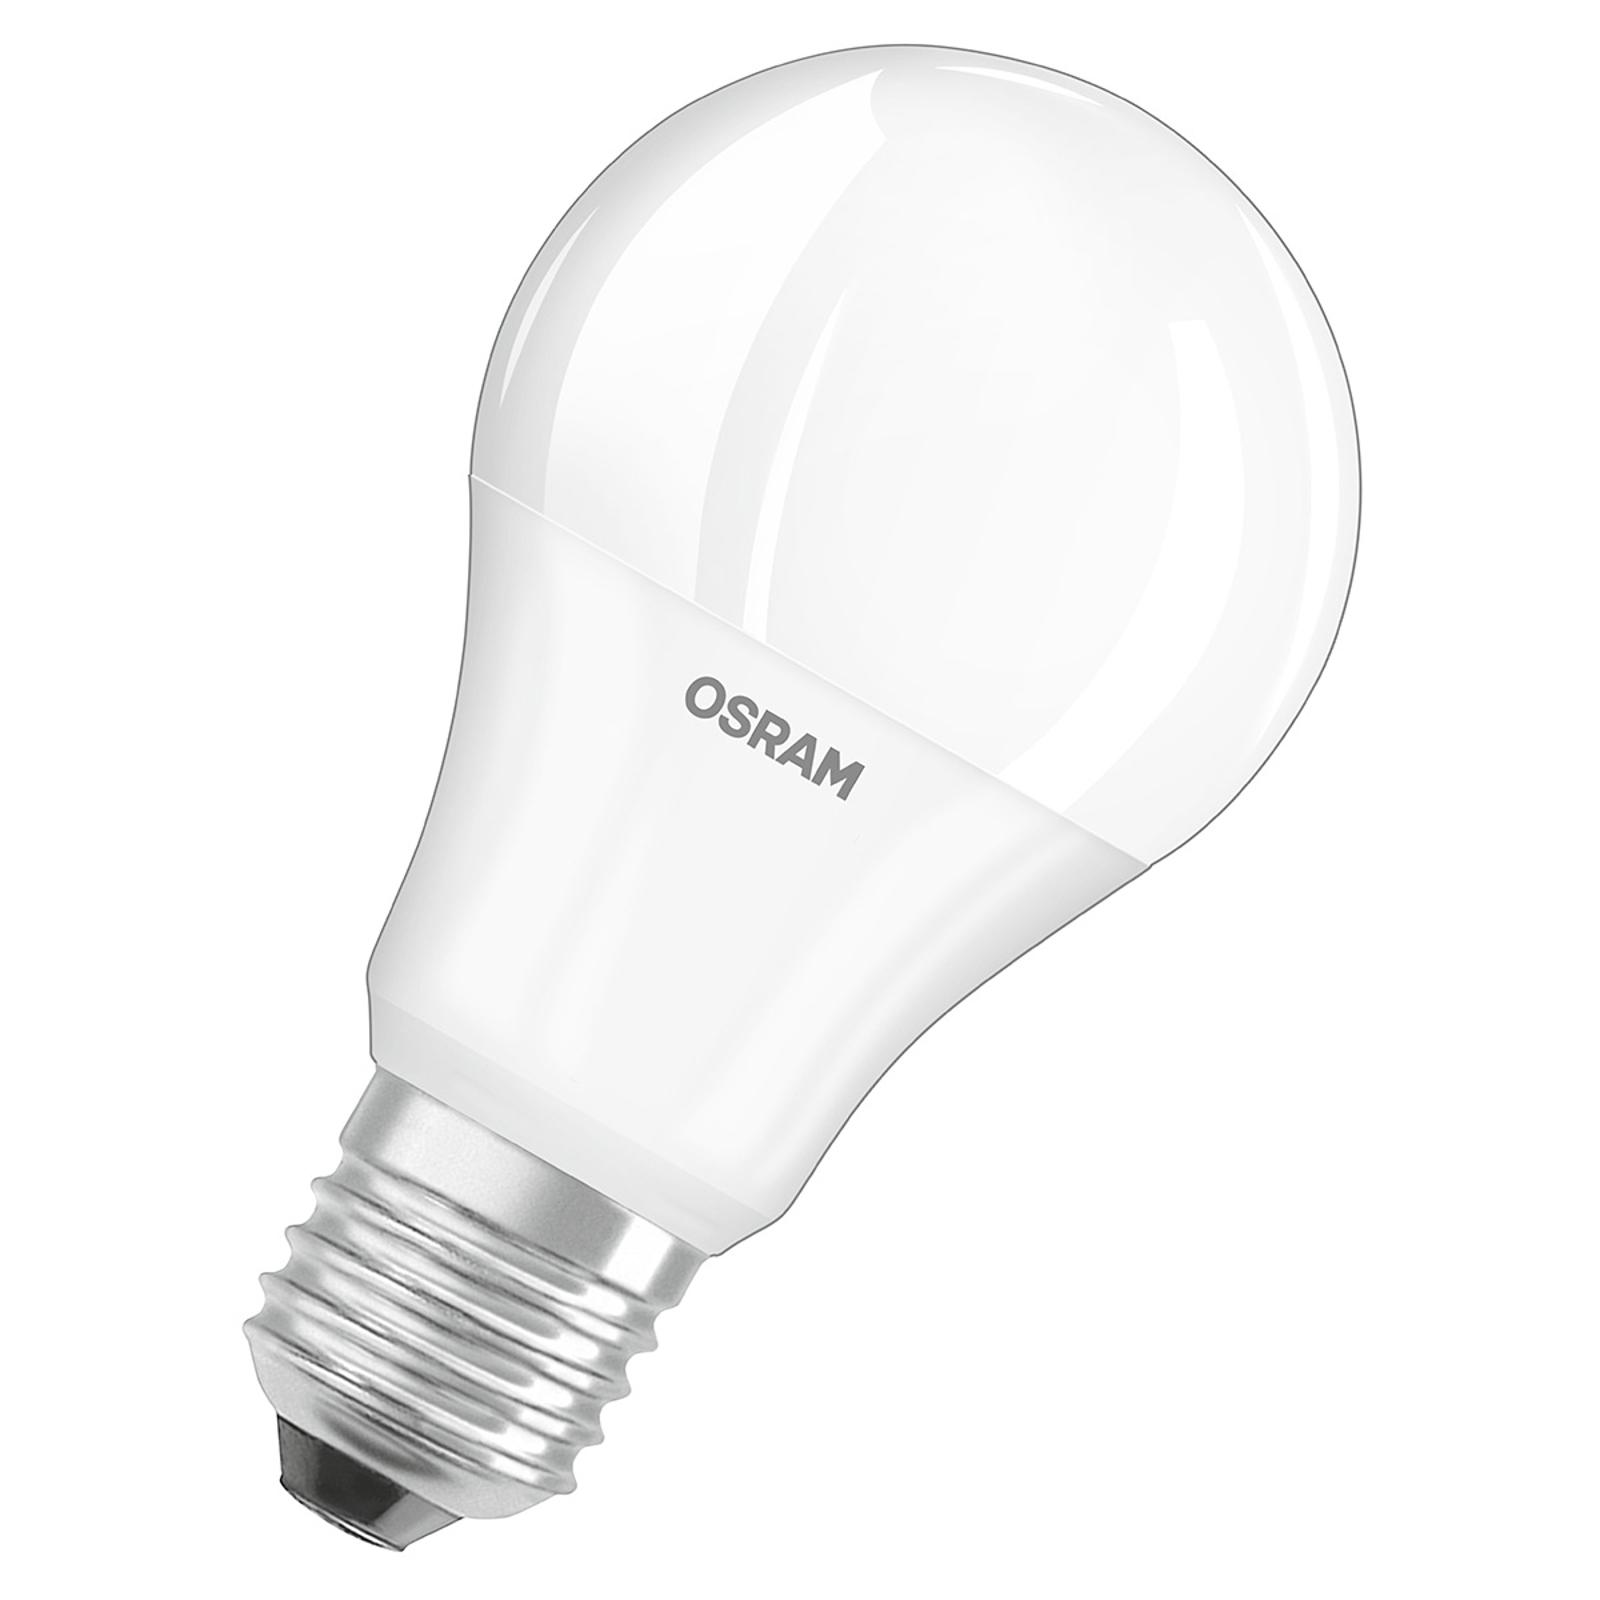 OSRAM LED-Lampe E27 5,5W Star 827 470lm